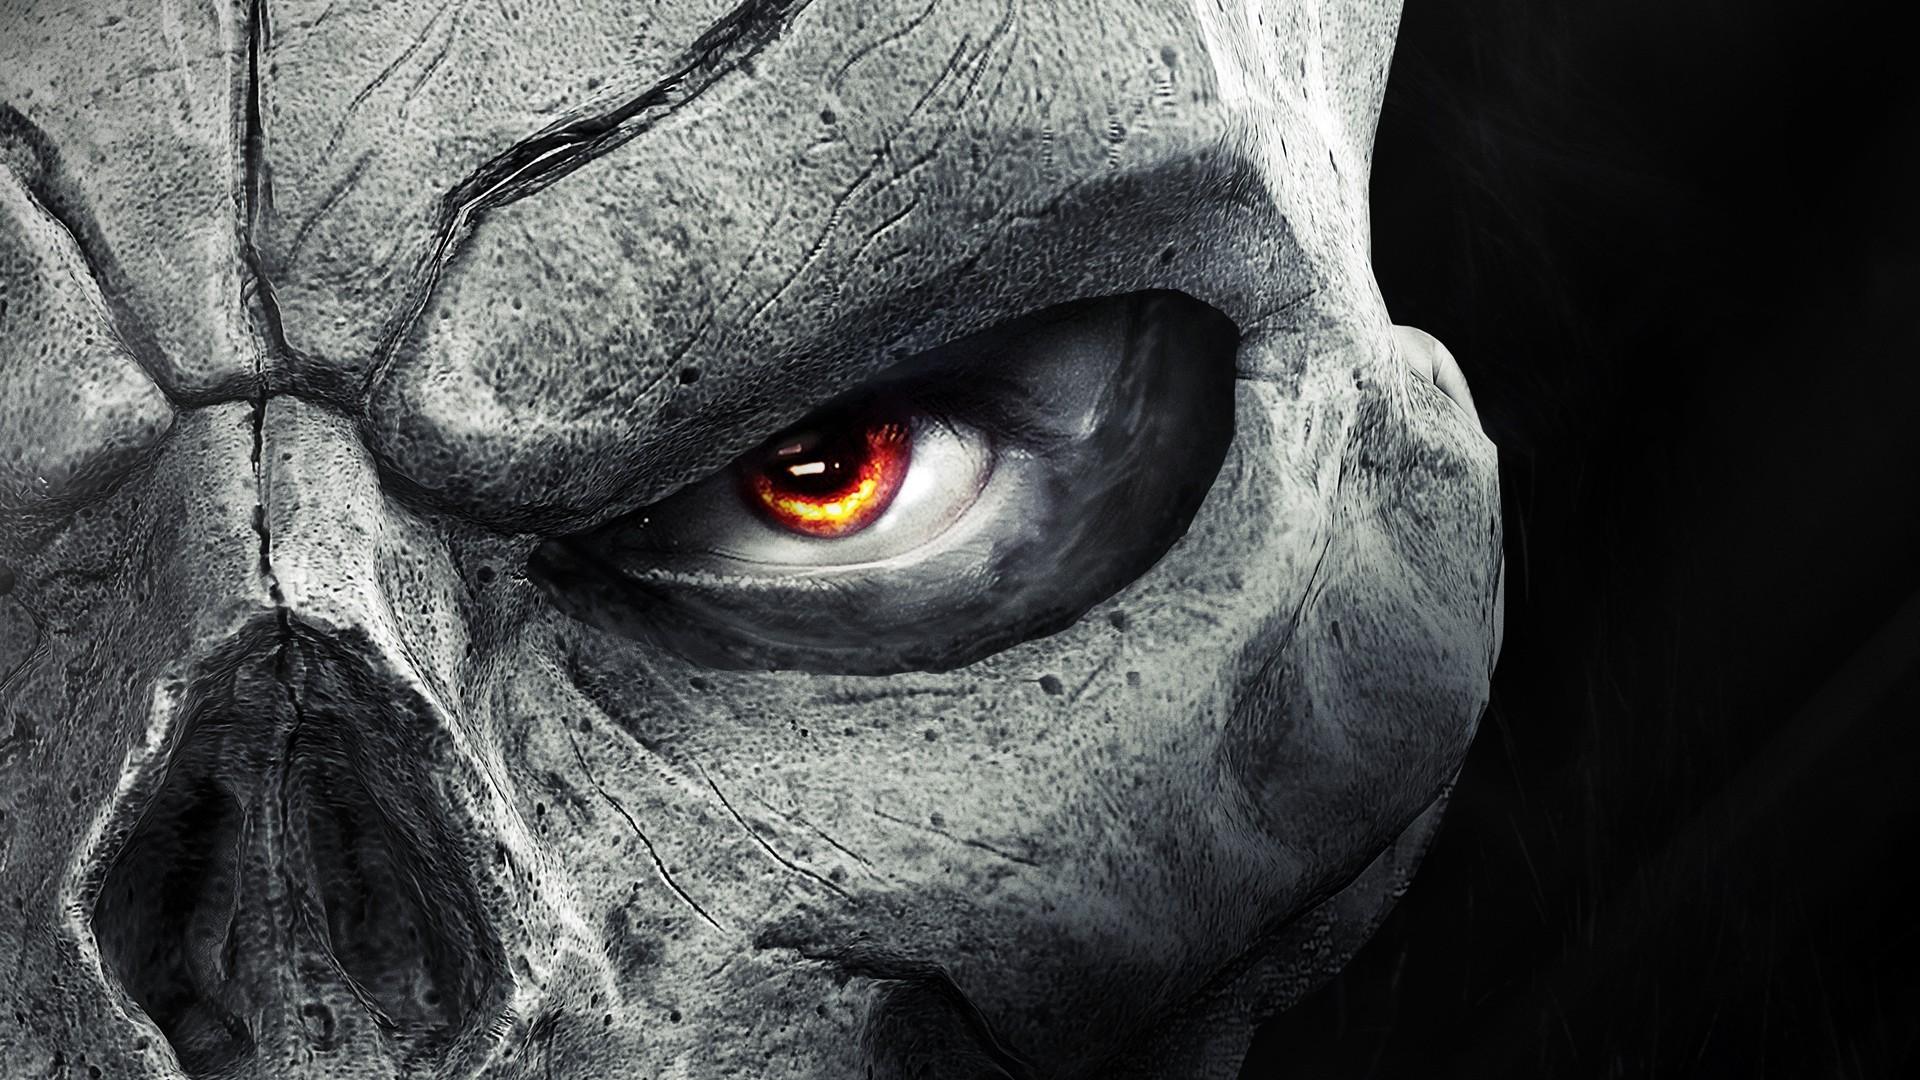 General 1920x1080 Darksiders 2 skull video games frontal view